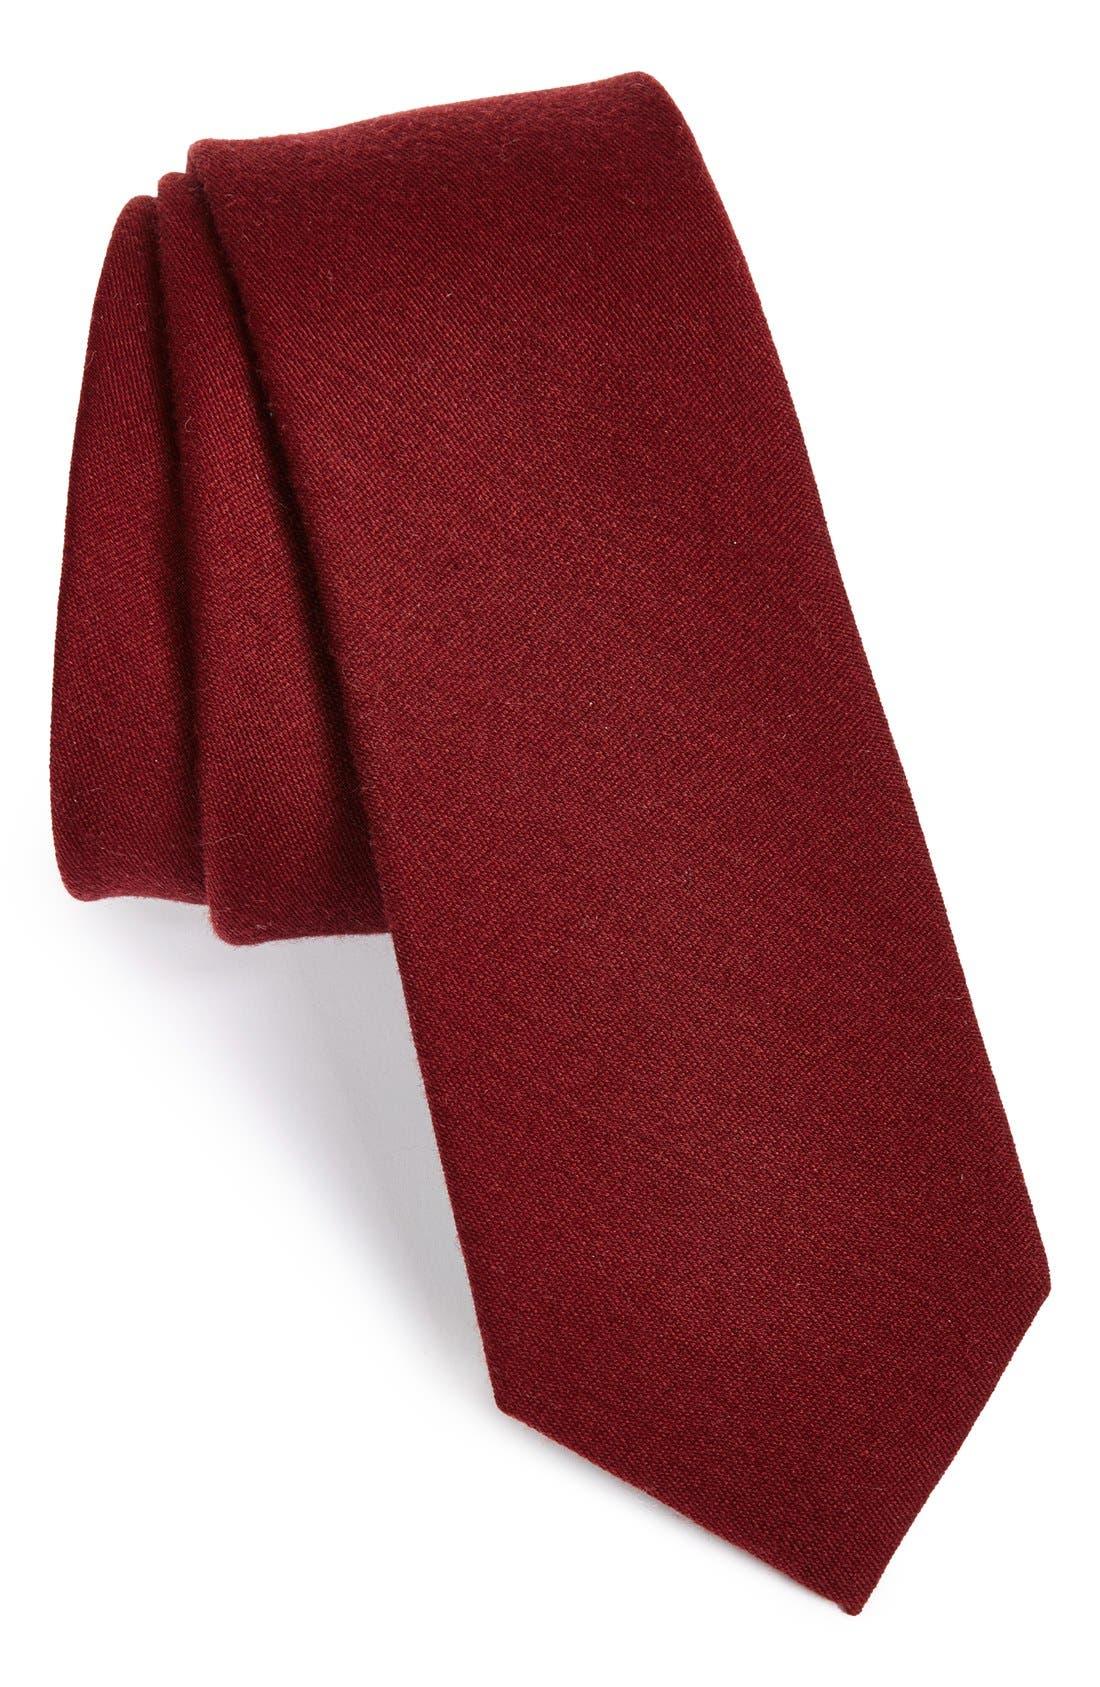 Main Image - The Tie Bar Wool & Silk Solid Tie